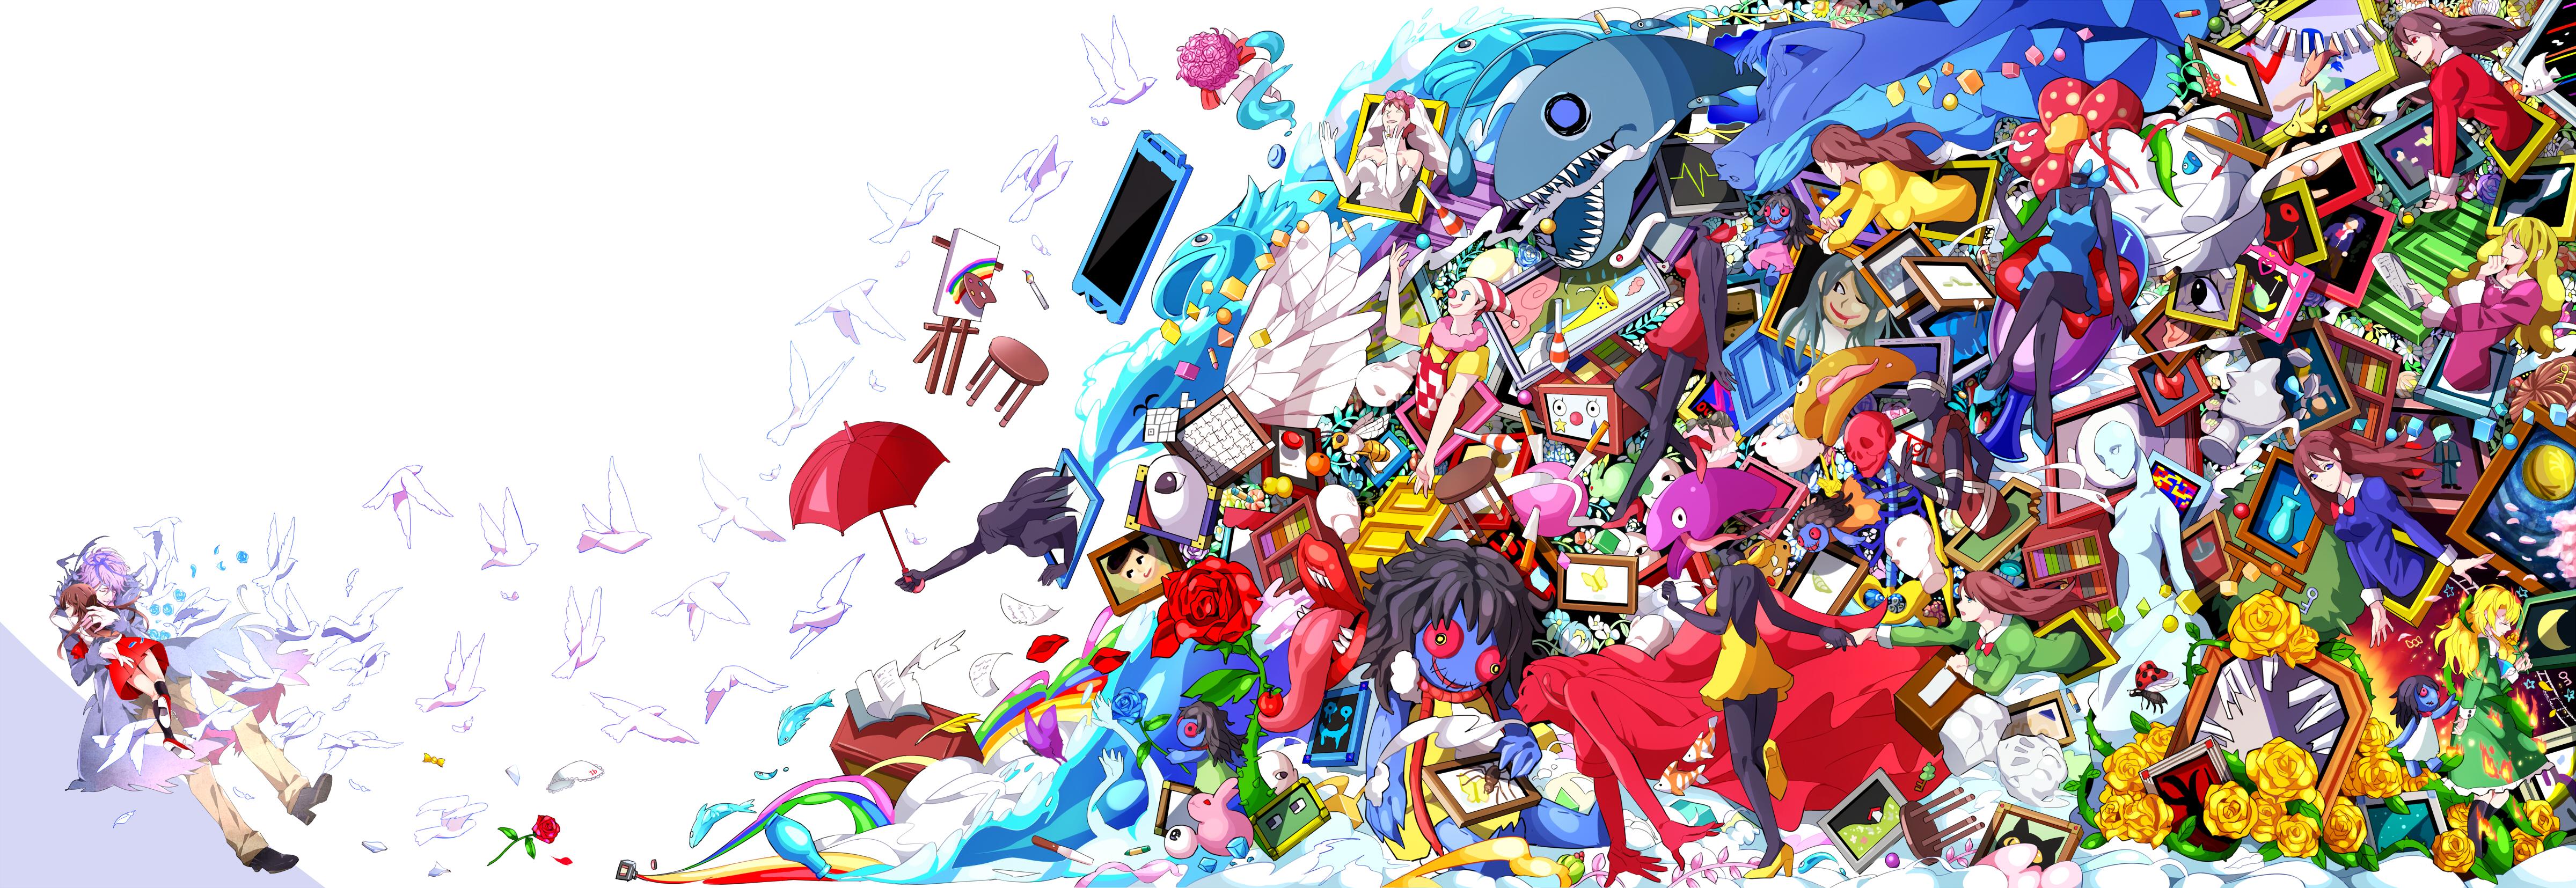 ib game wallpaper - photo #24